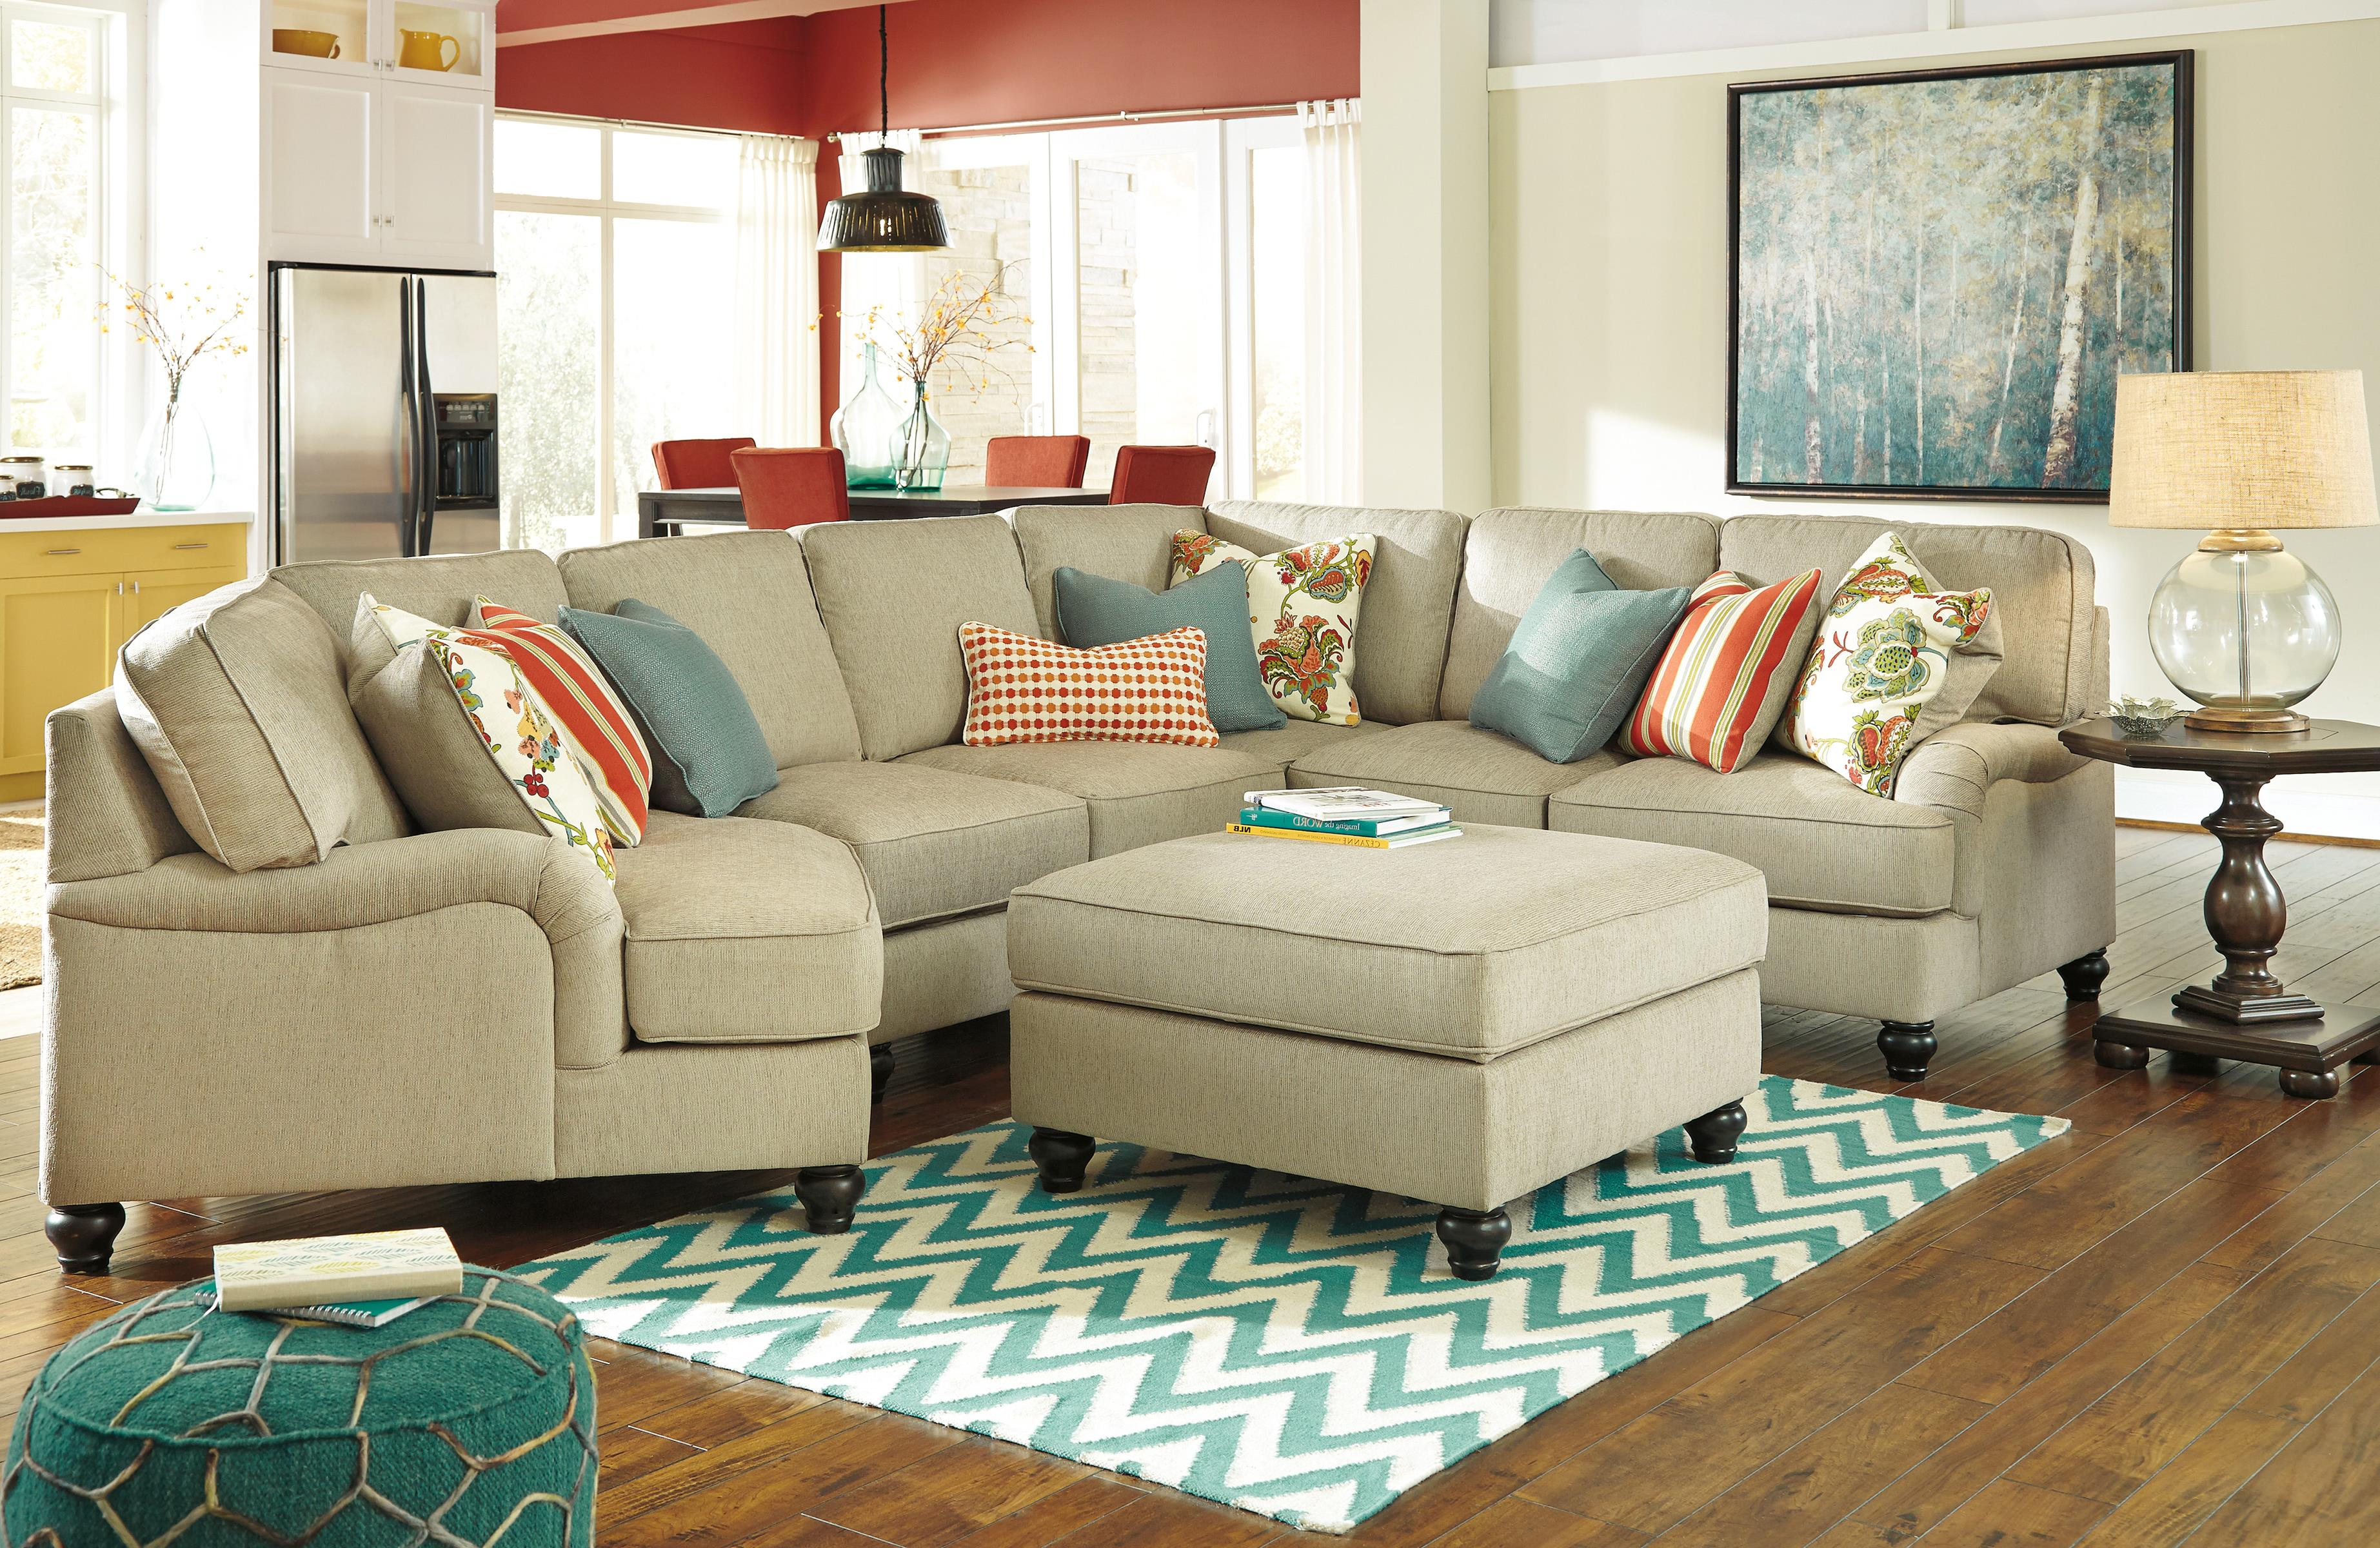 Ashley/Benchcraft Kerridon Stationary Living Room Group - Item Number: 26300 Living Room Group 9